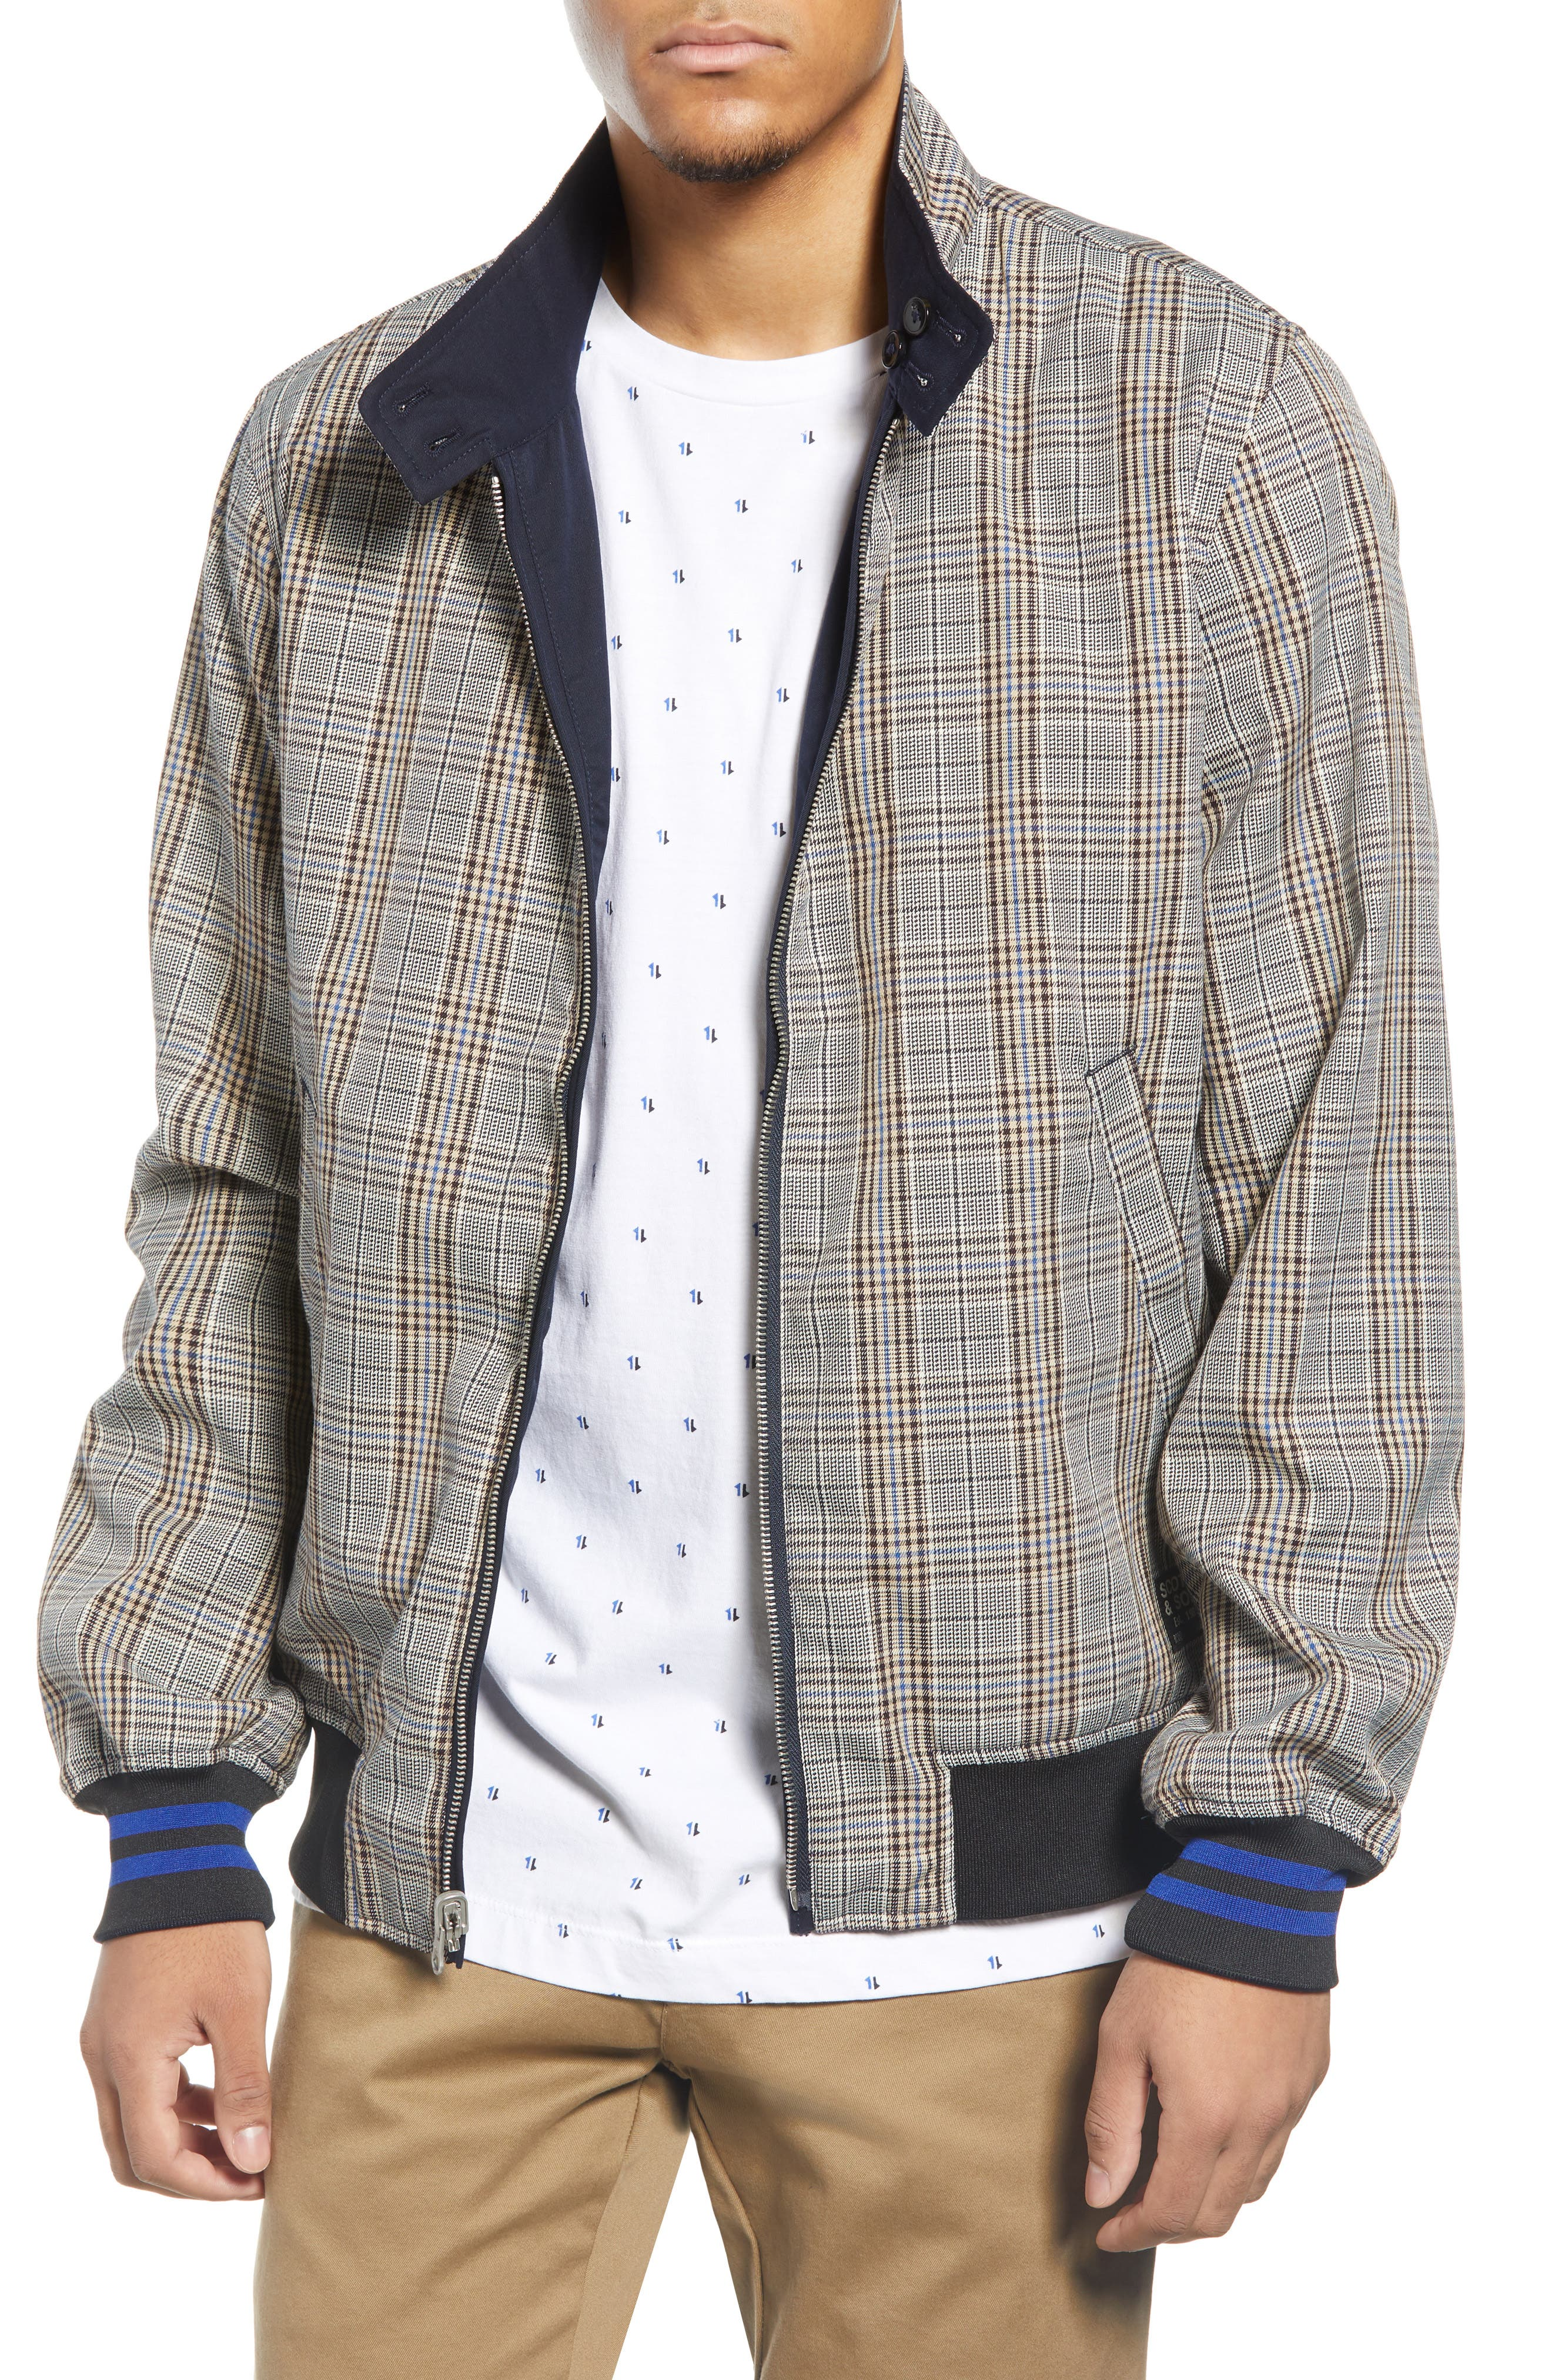 60s 70s Men's Jackets & Sweaters Mens Scotch  Soda Reversible Zip Jacket $124.00 AT vintagedancer.com